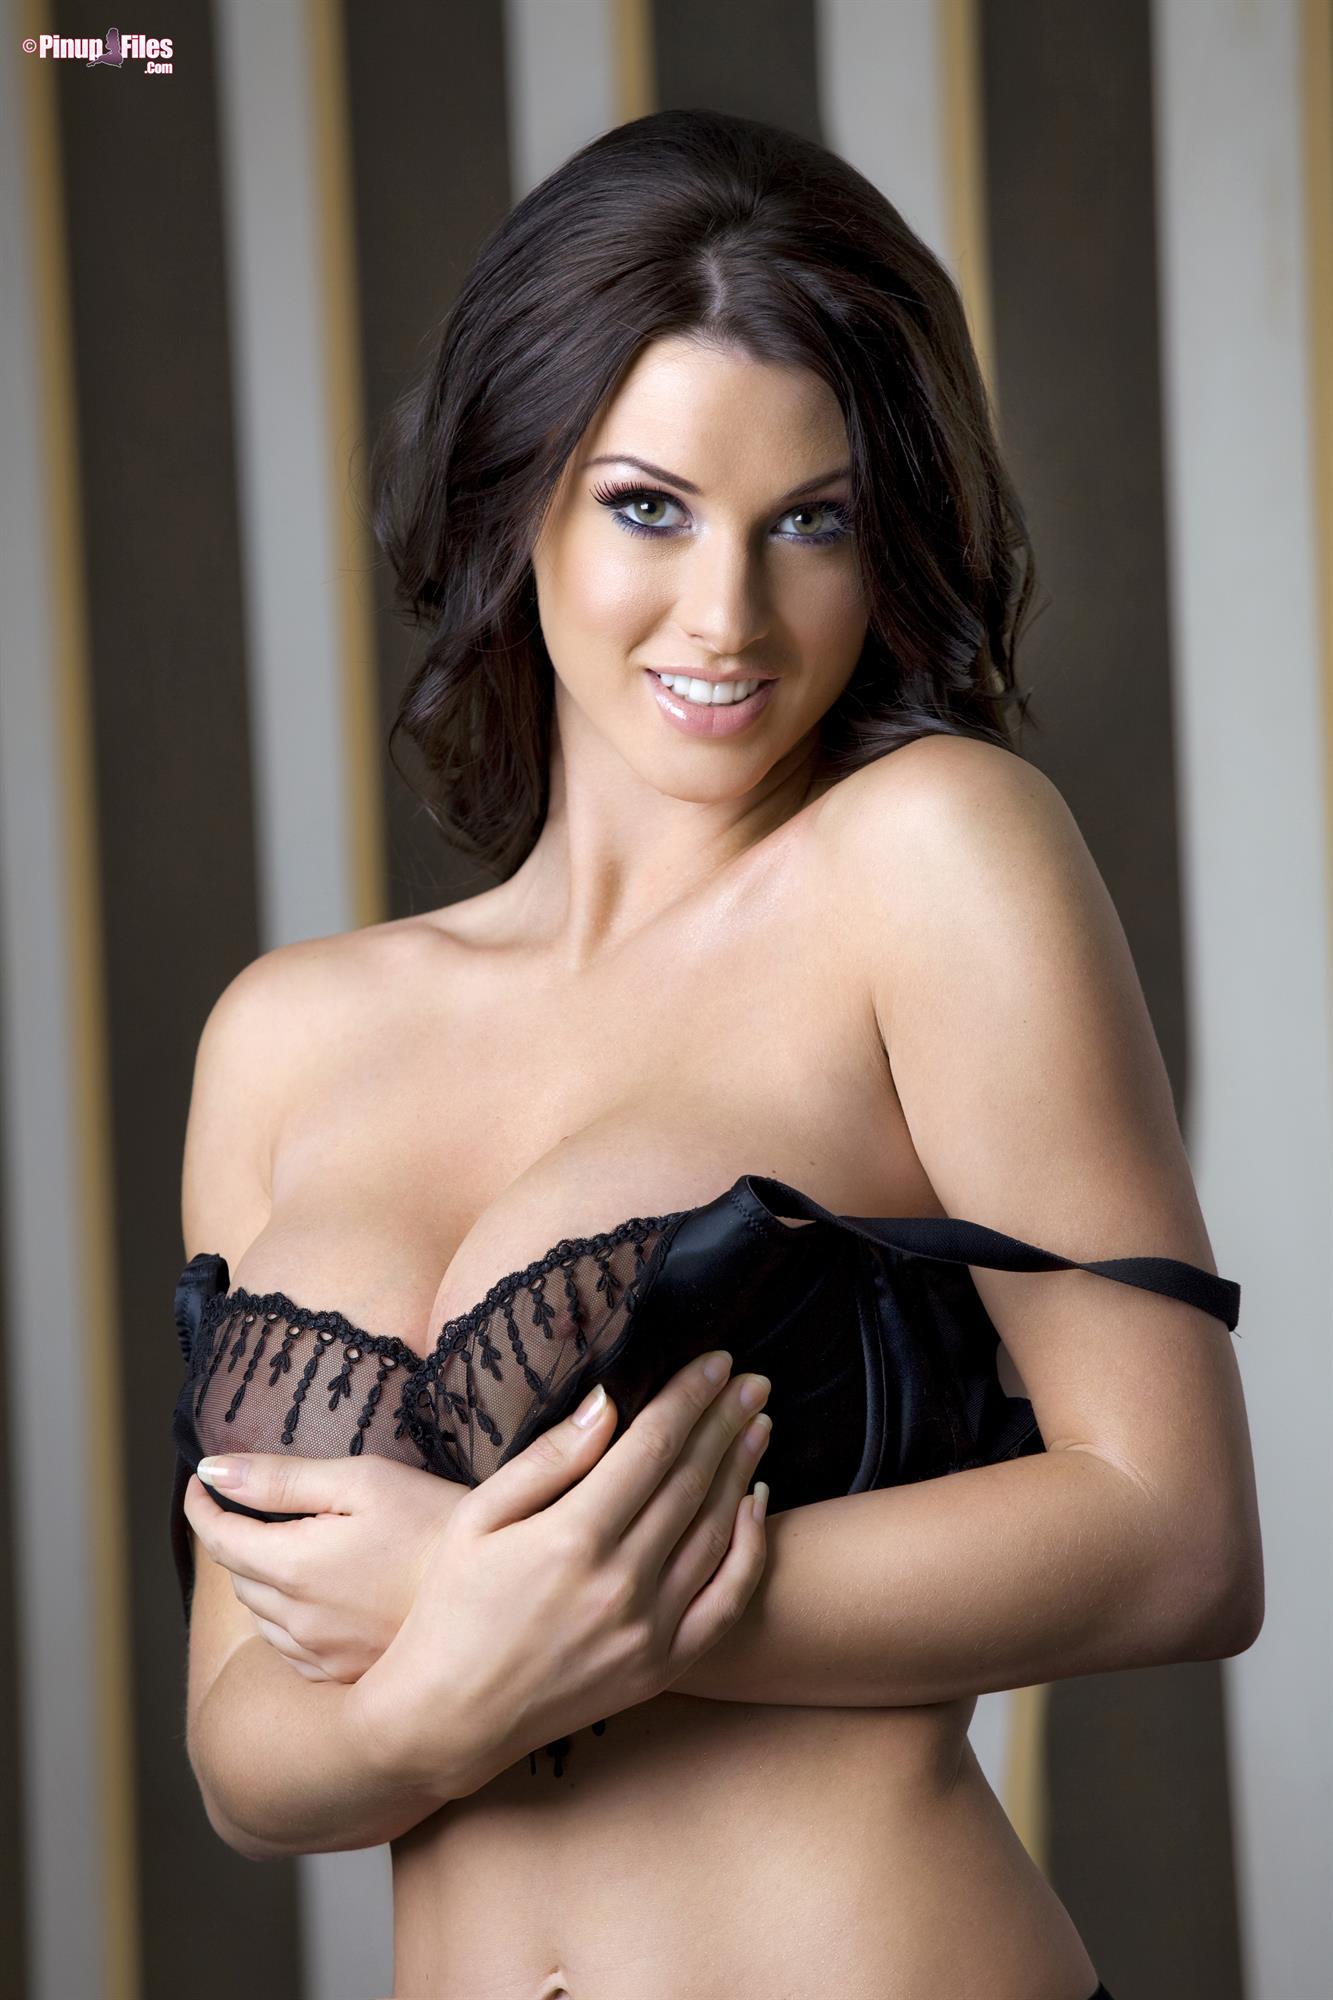 Alice Goodwin Porn Forums alice goodwin has huge tits 9.58/10